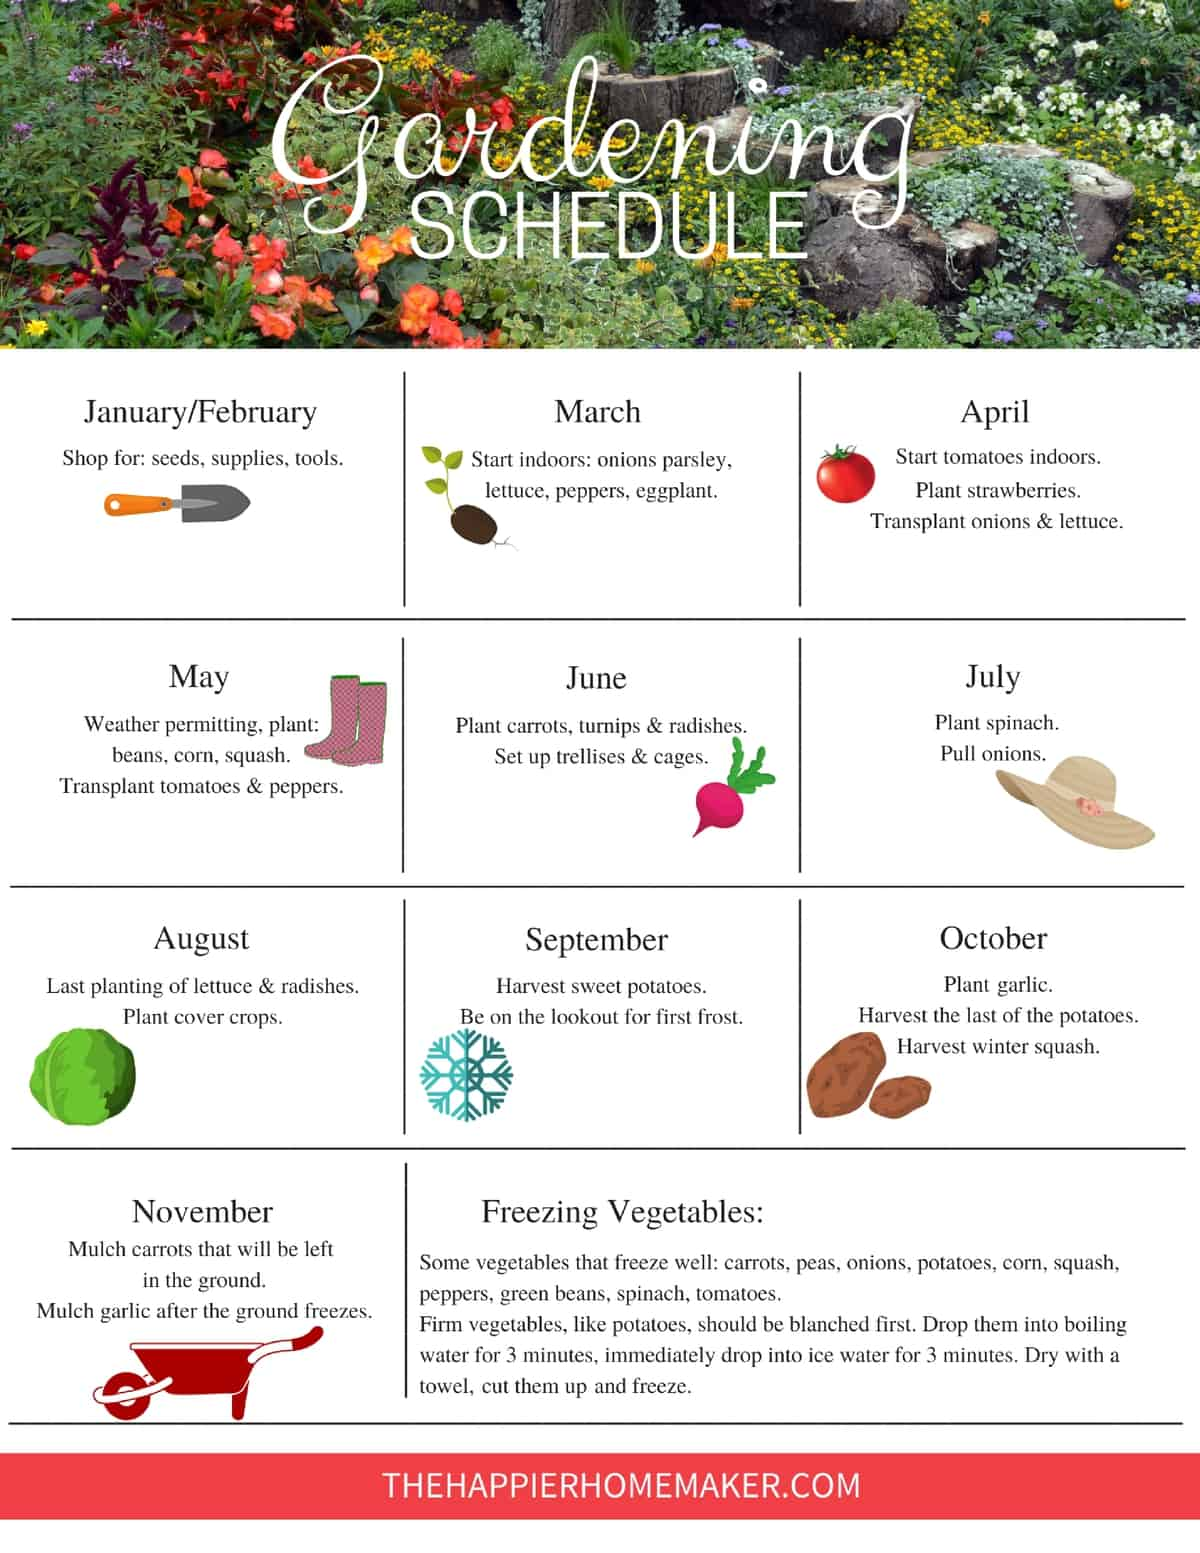 Free printable Garden Schedule to help you plan your gardening tasks throughout the year. #gardening